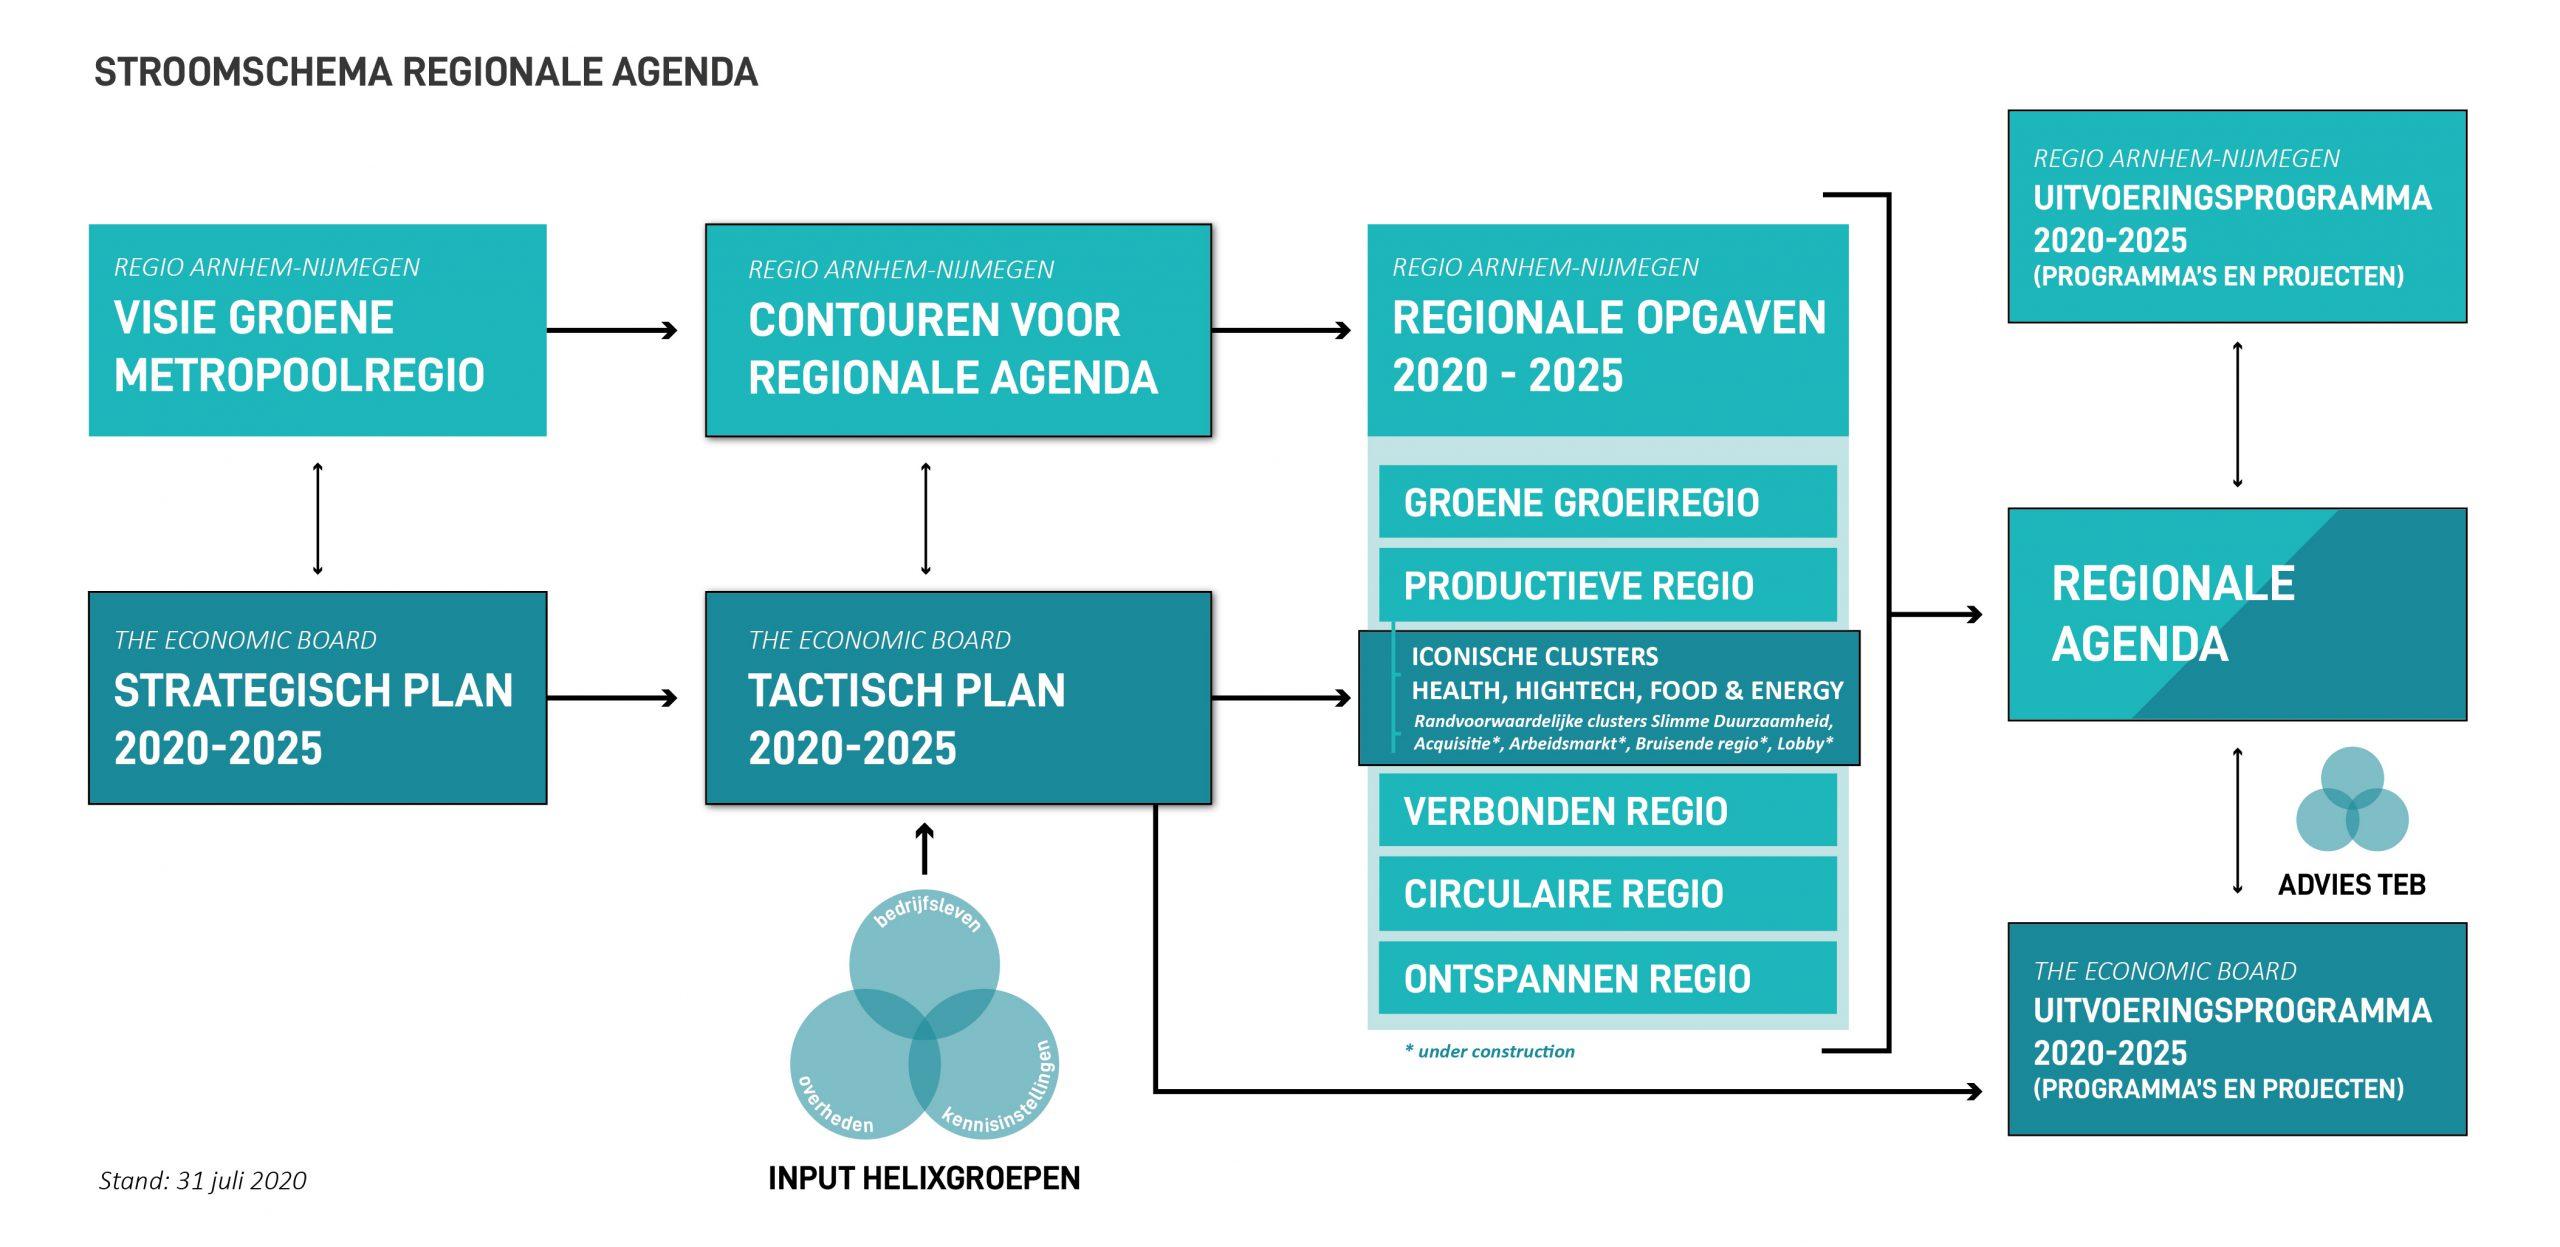 Stroomschema Regionale Agenda